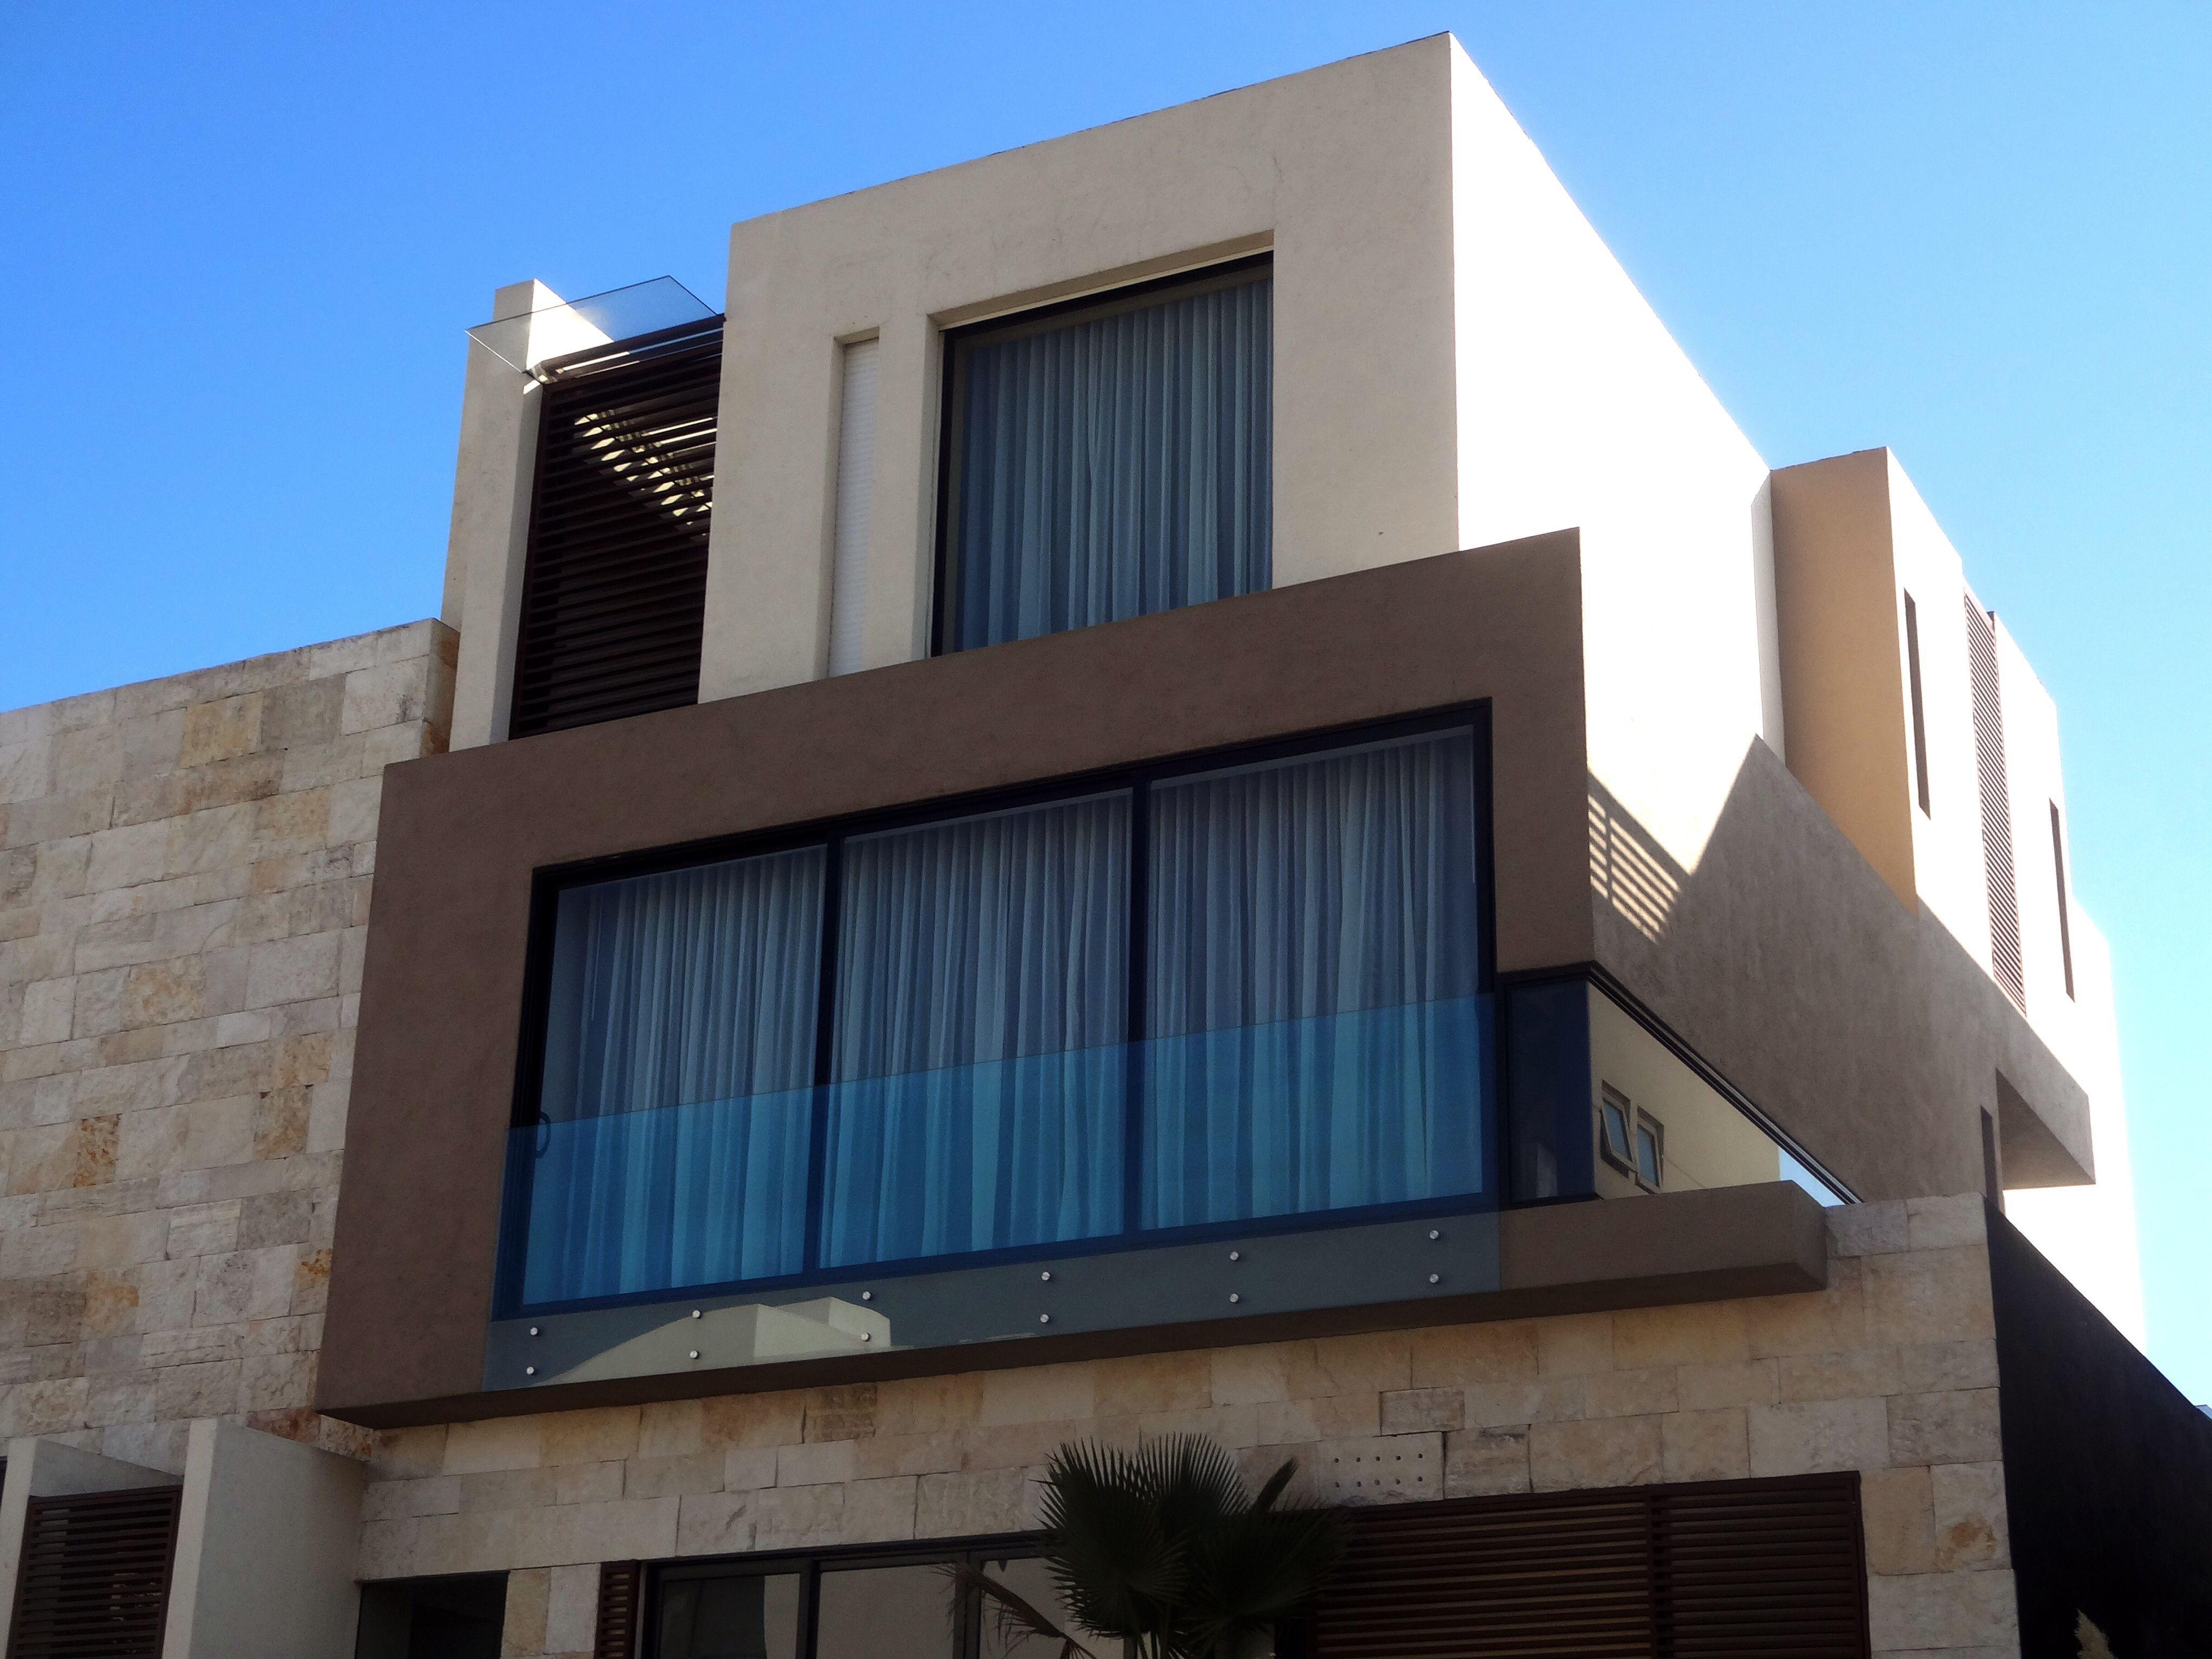 Casa ss fachada muros de piedra celosia de madera for Fachadas de ventanas para casas modernas